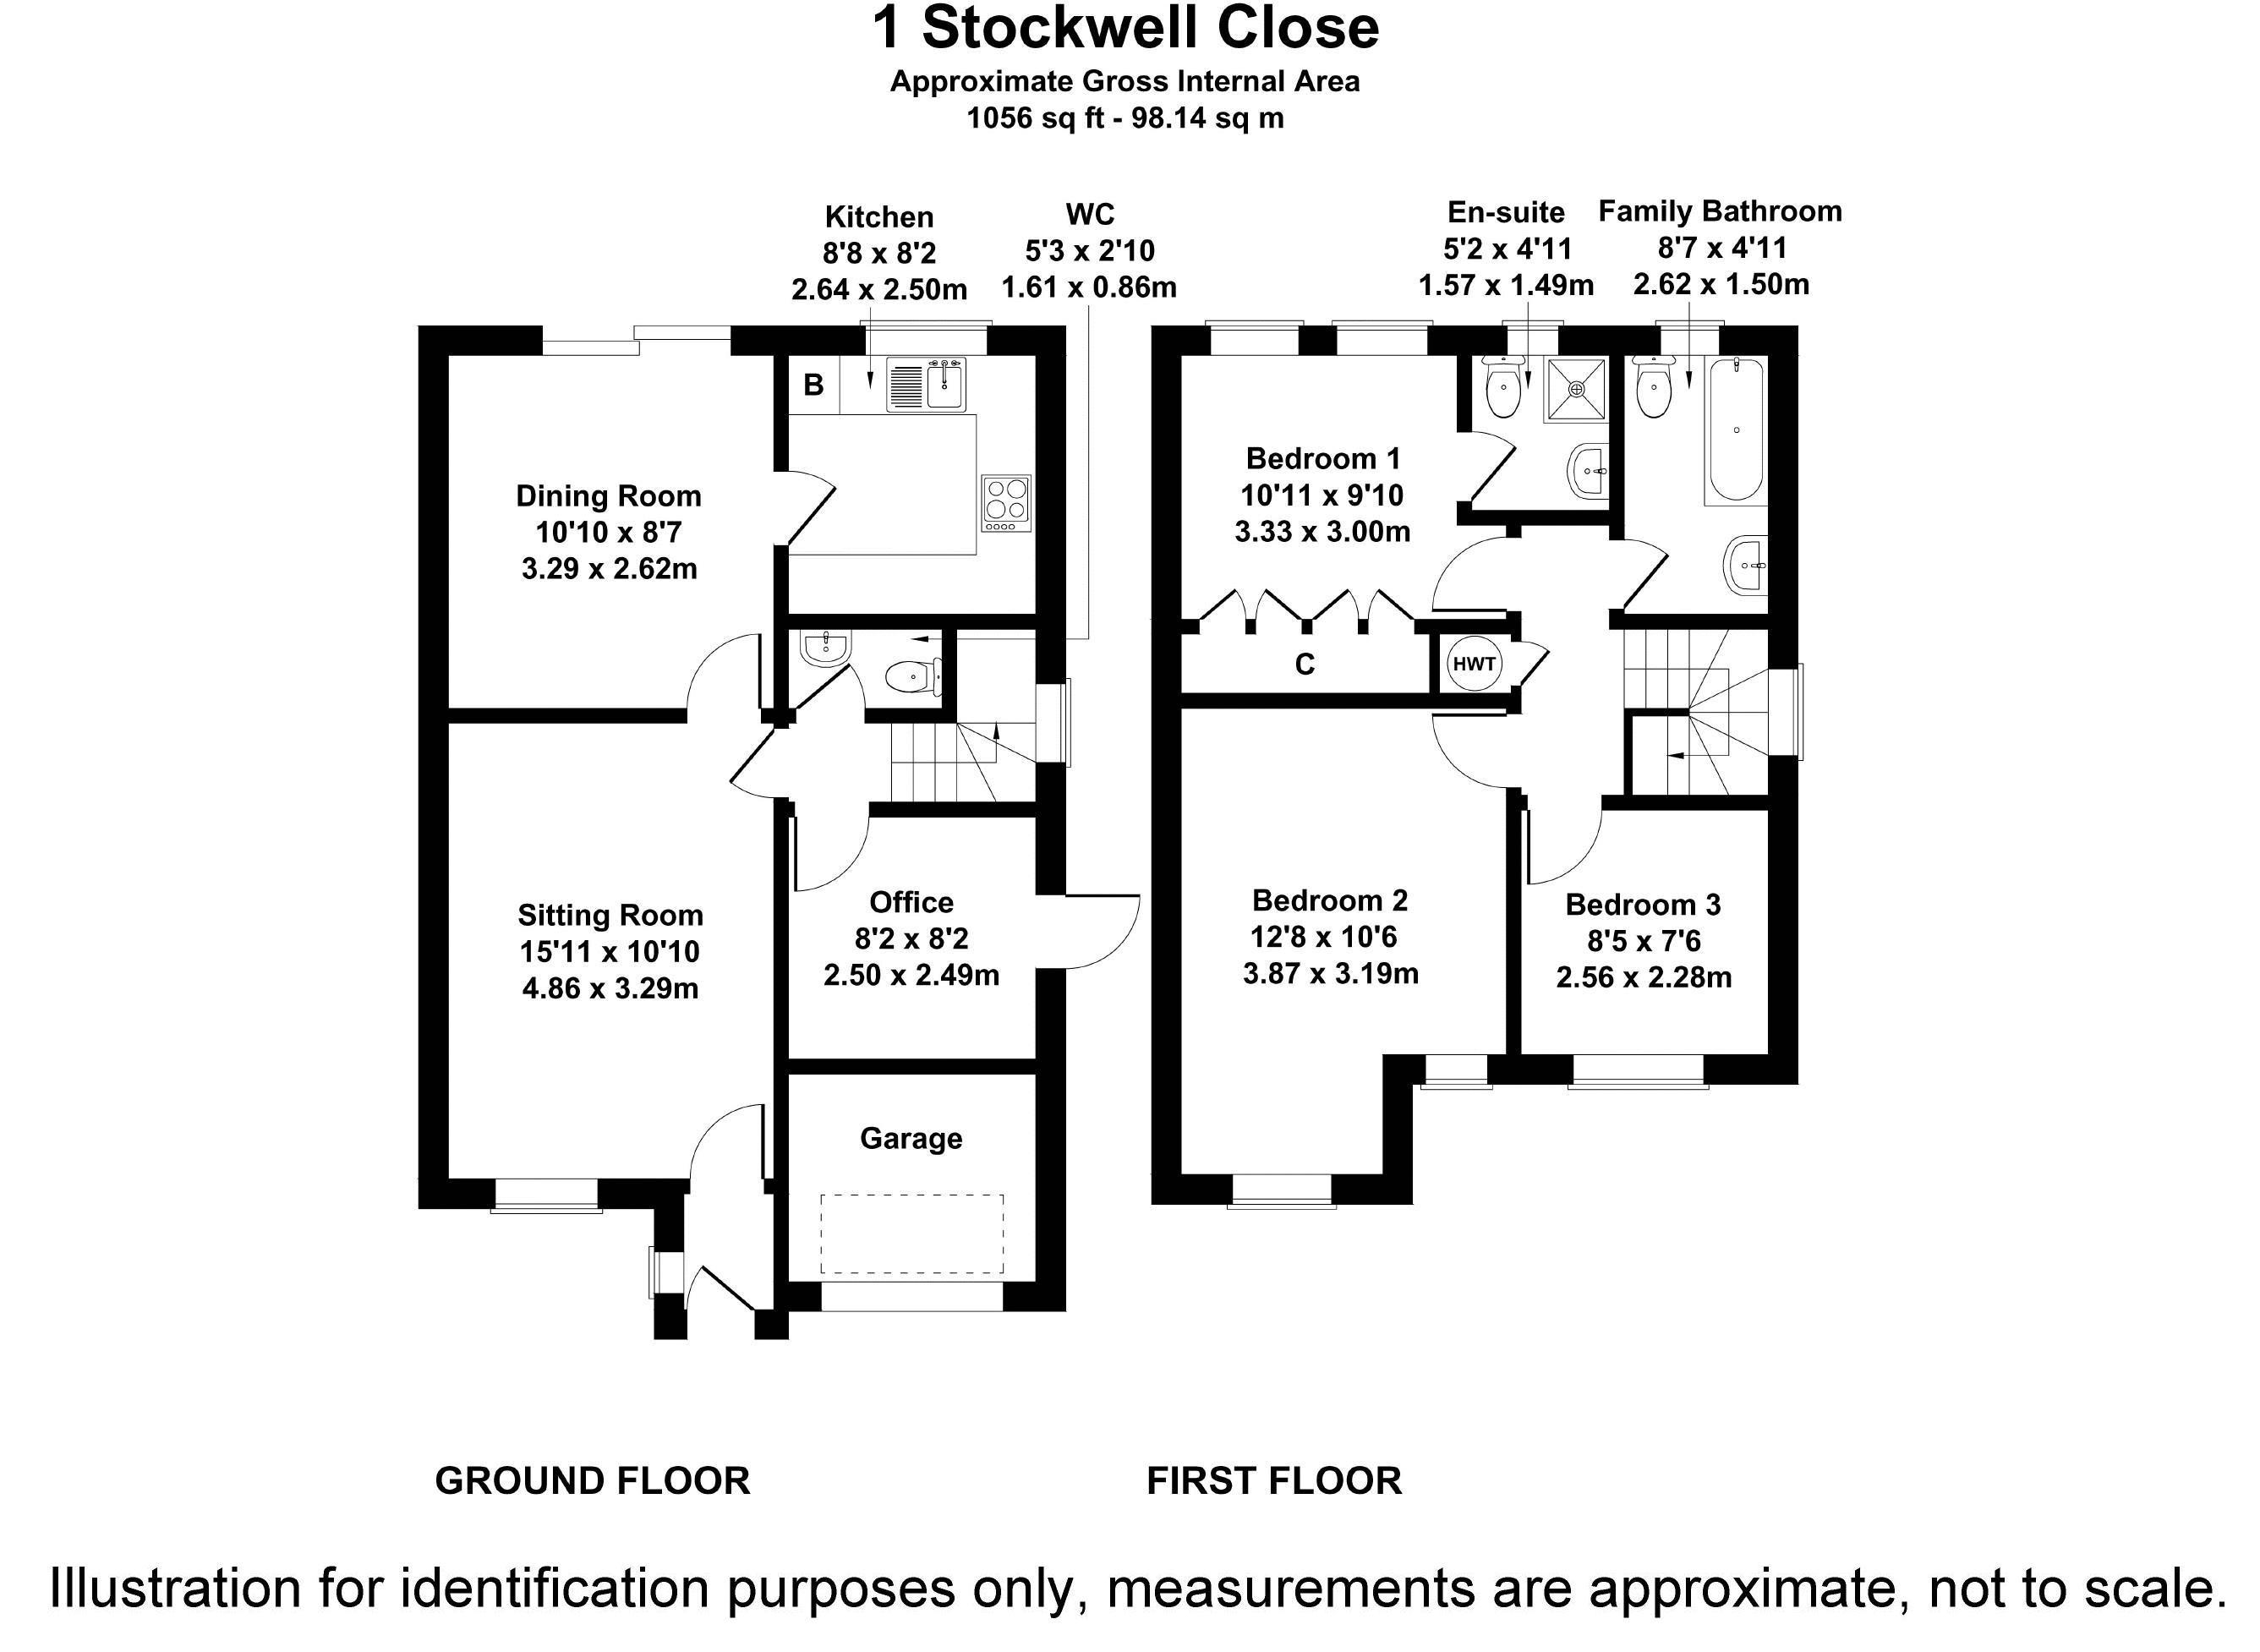 Stockwell Close